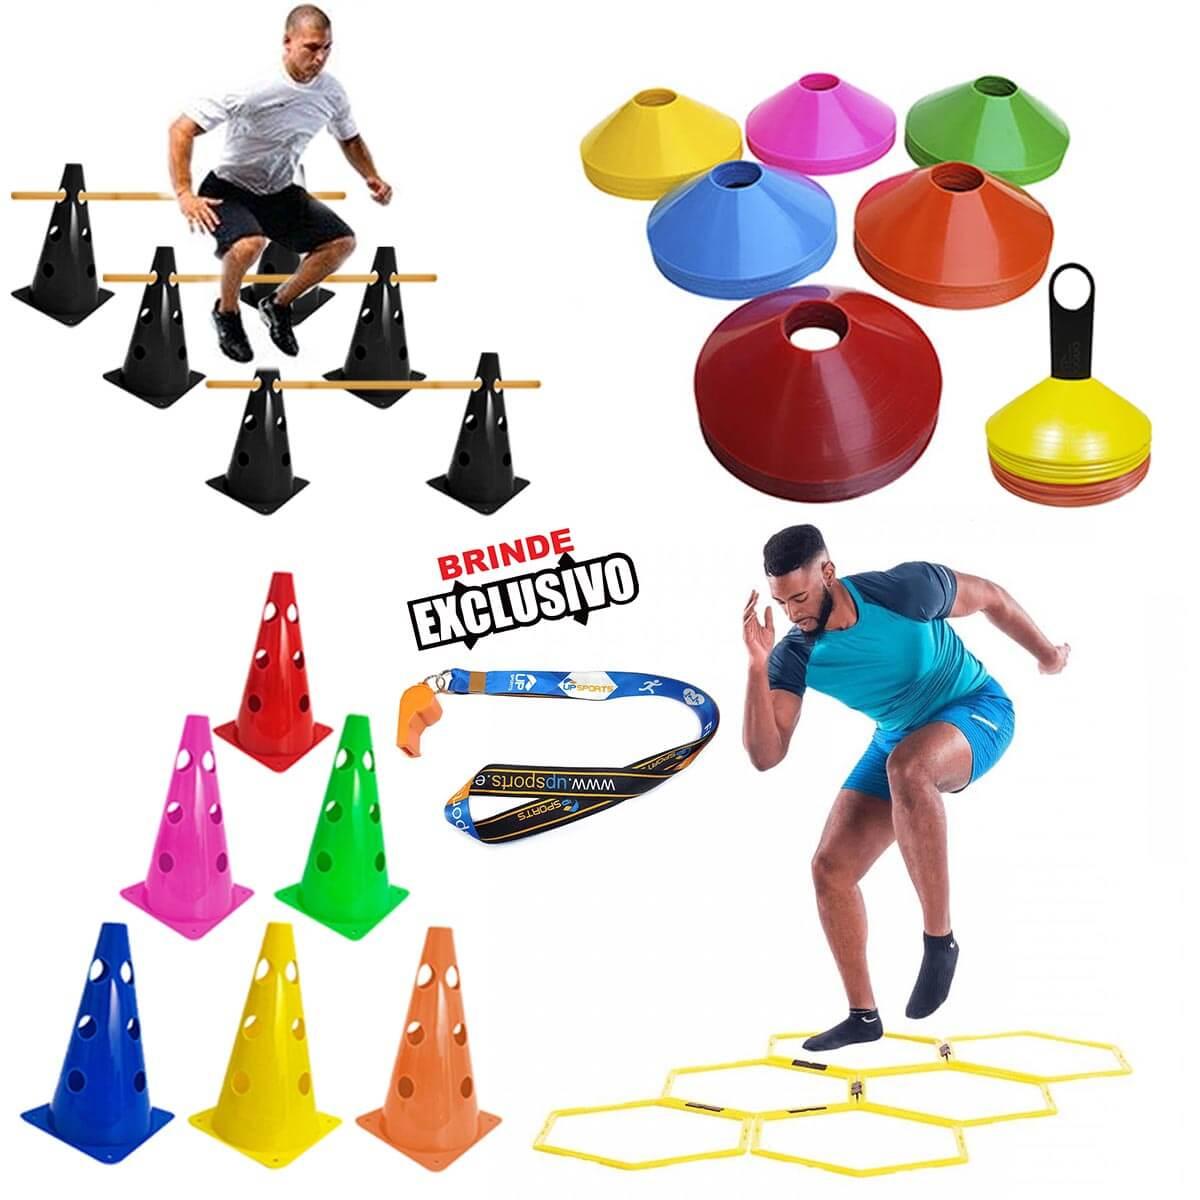 Kit p/ Treinamento Funcional 18 Argolas + 10 Chapeu + 10 Cones + 5 Barreiras